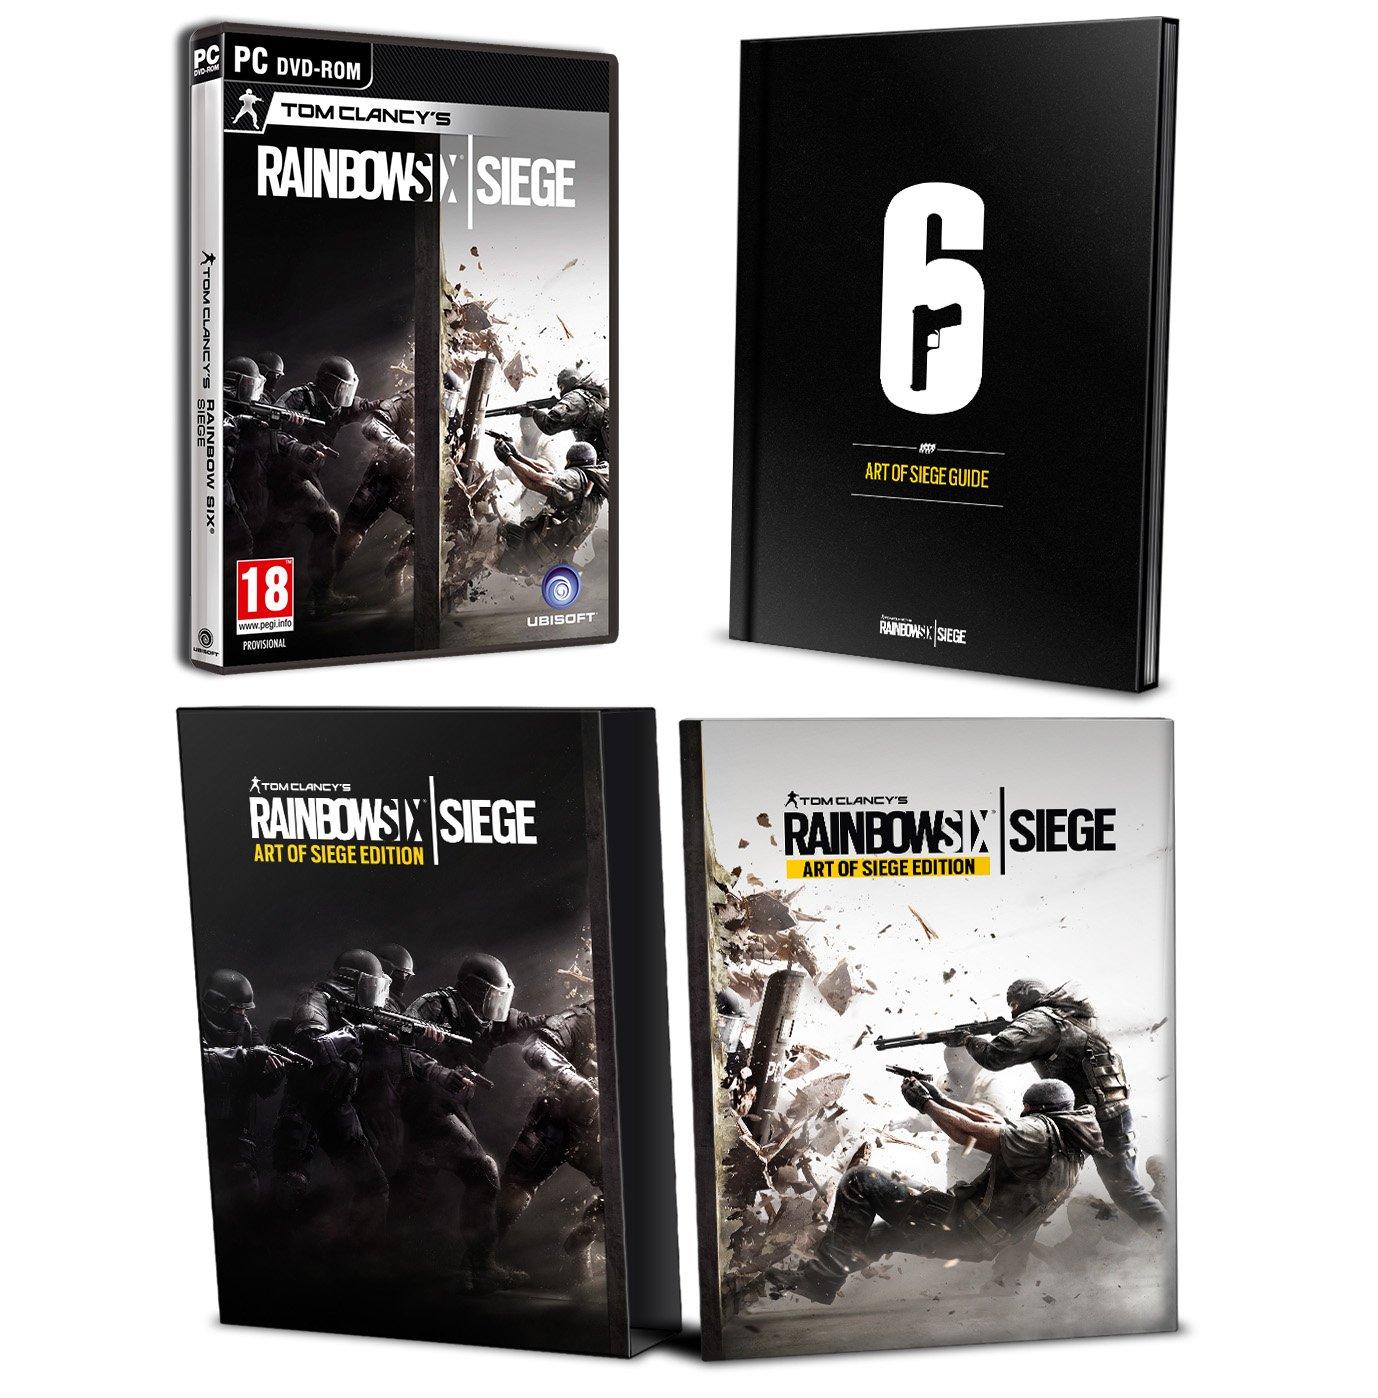 Tom Clancy's Rainbow Six Siege- Art of Siege Edition (PC DVD